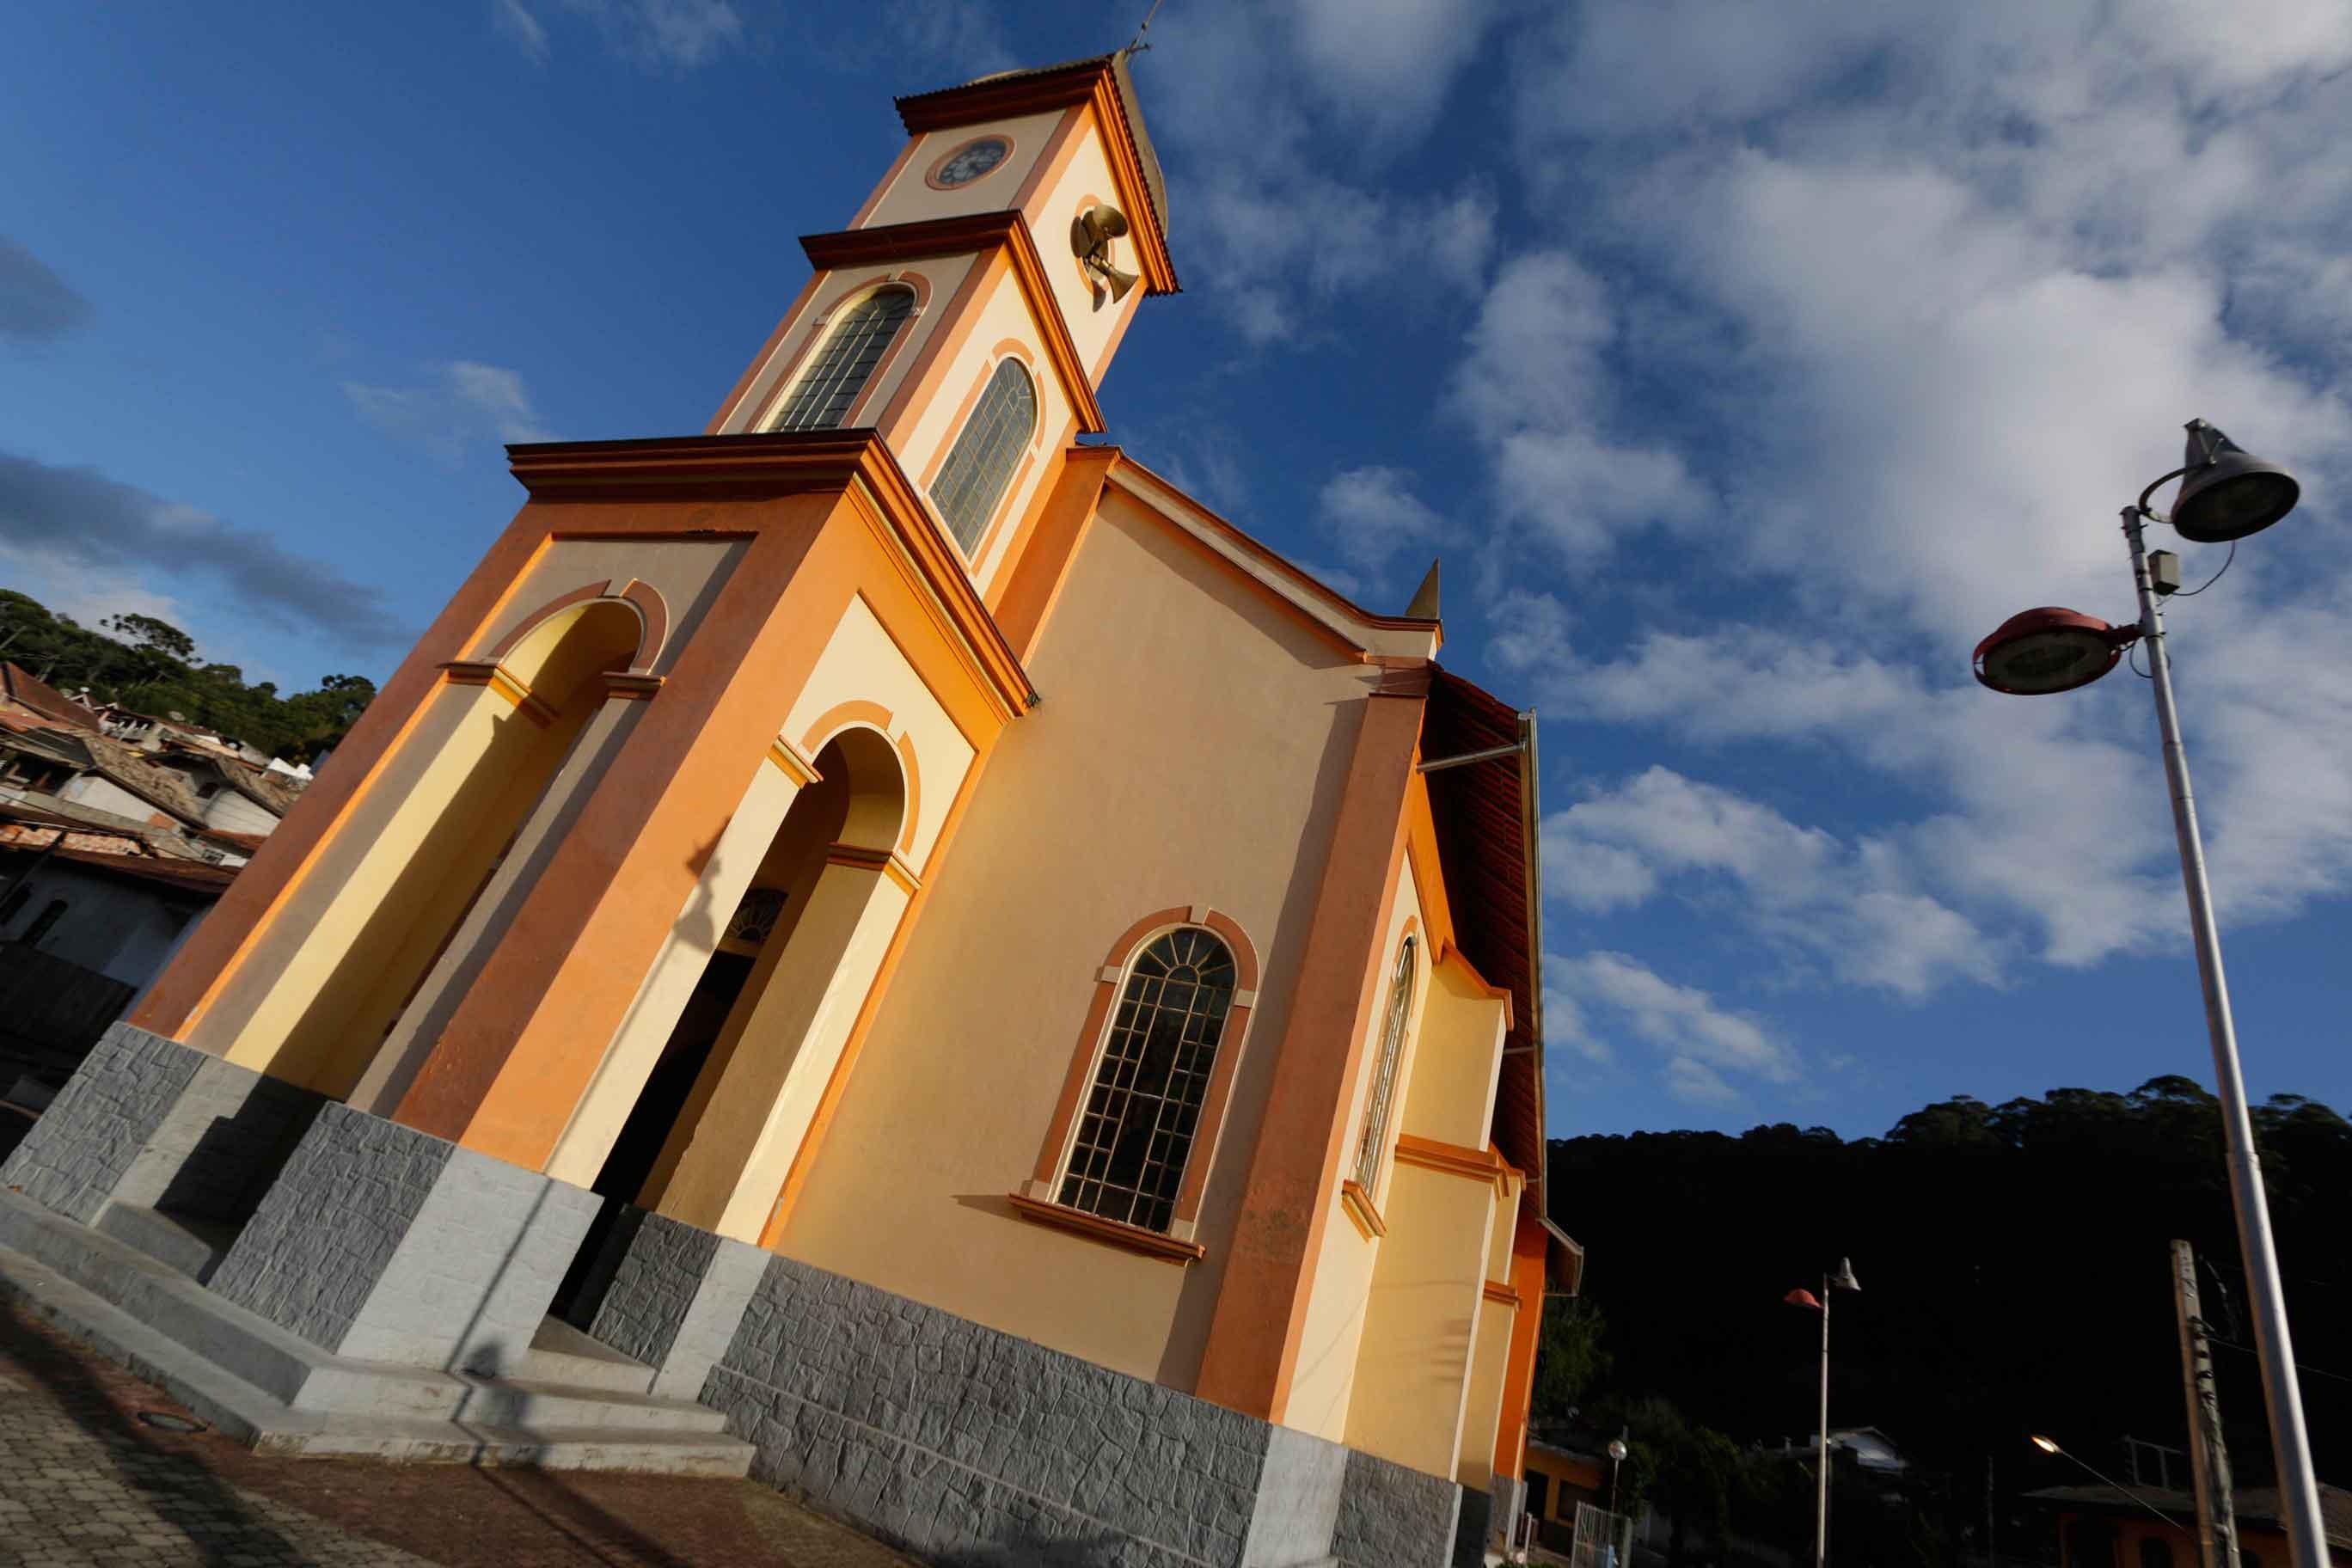 Santo-Antonio-do-Pinhal-Turismo-Religioso-Igreja-Matriz-_MG_7089-bx